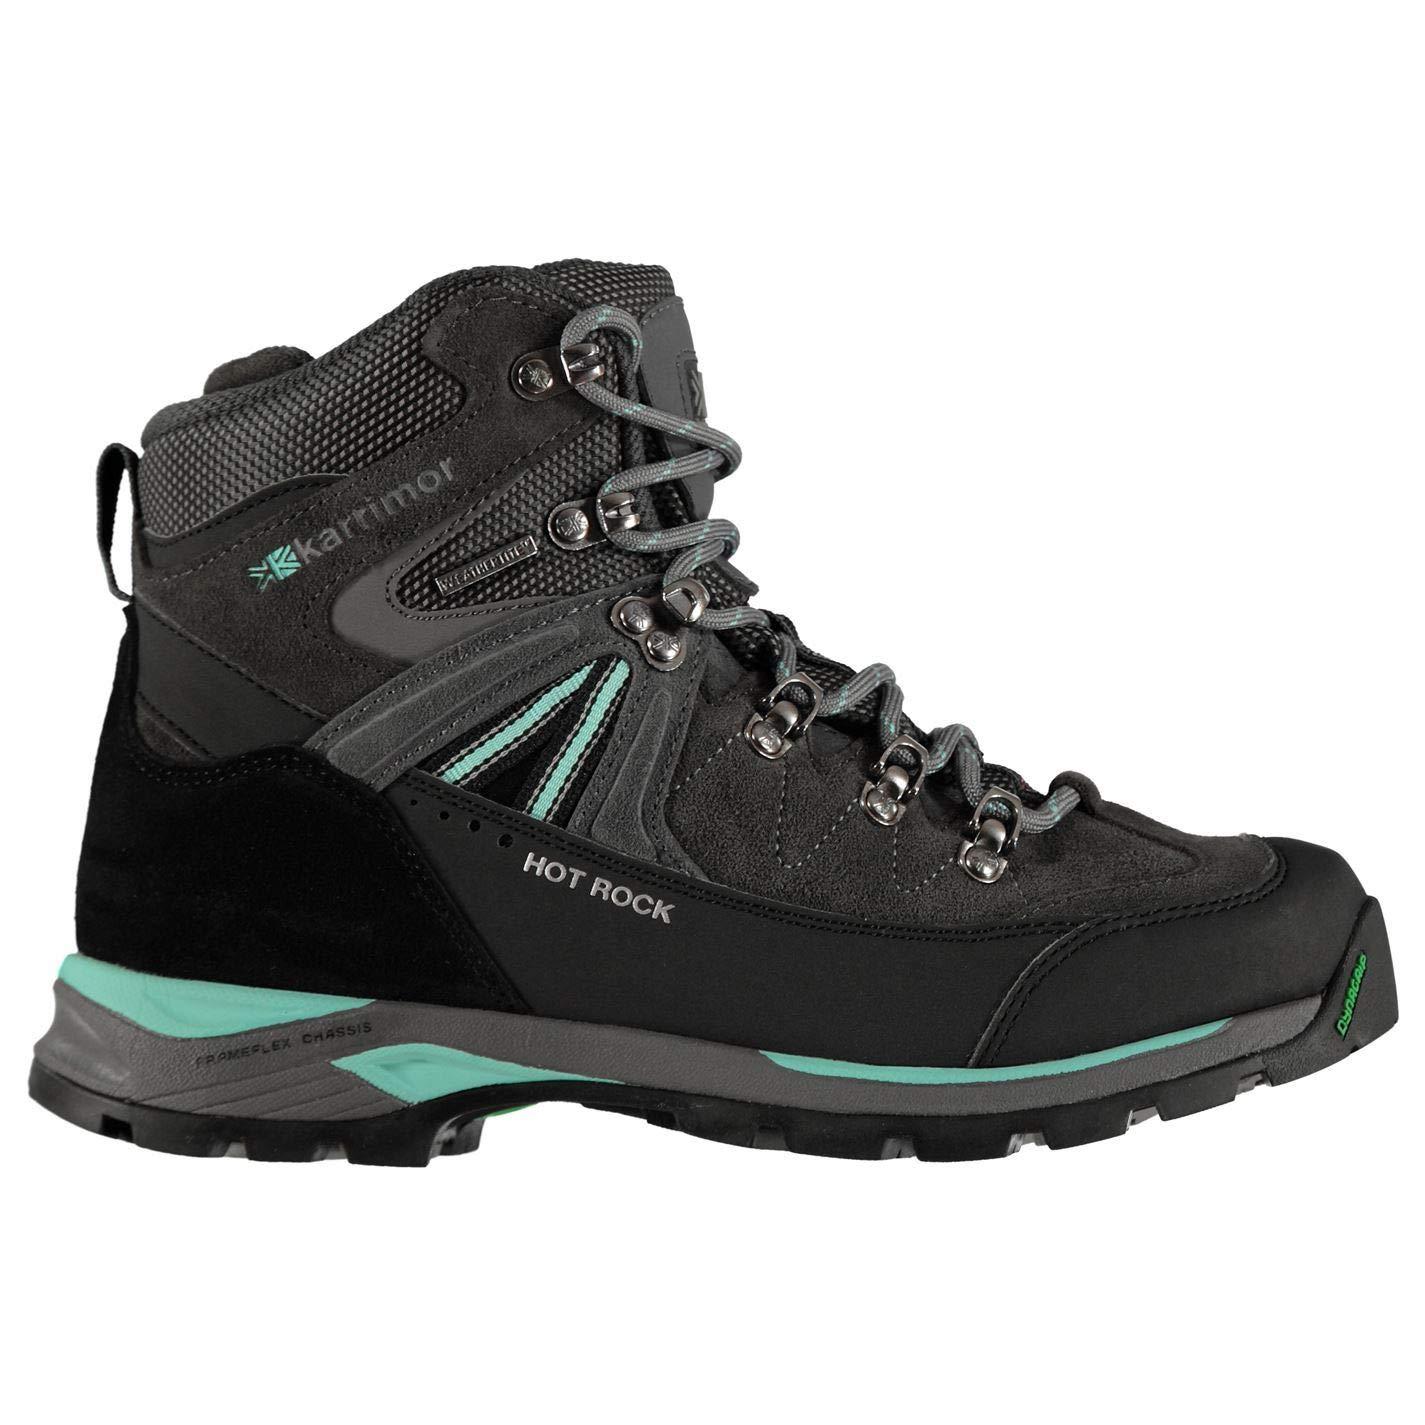 Karrimor Hot Rock WTX Walking Boots Womens Hiking Trekking Shoes Footwear